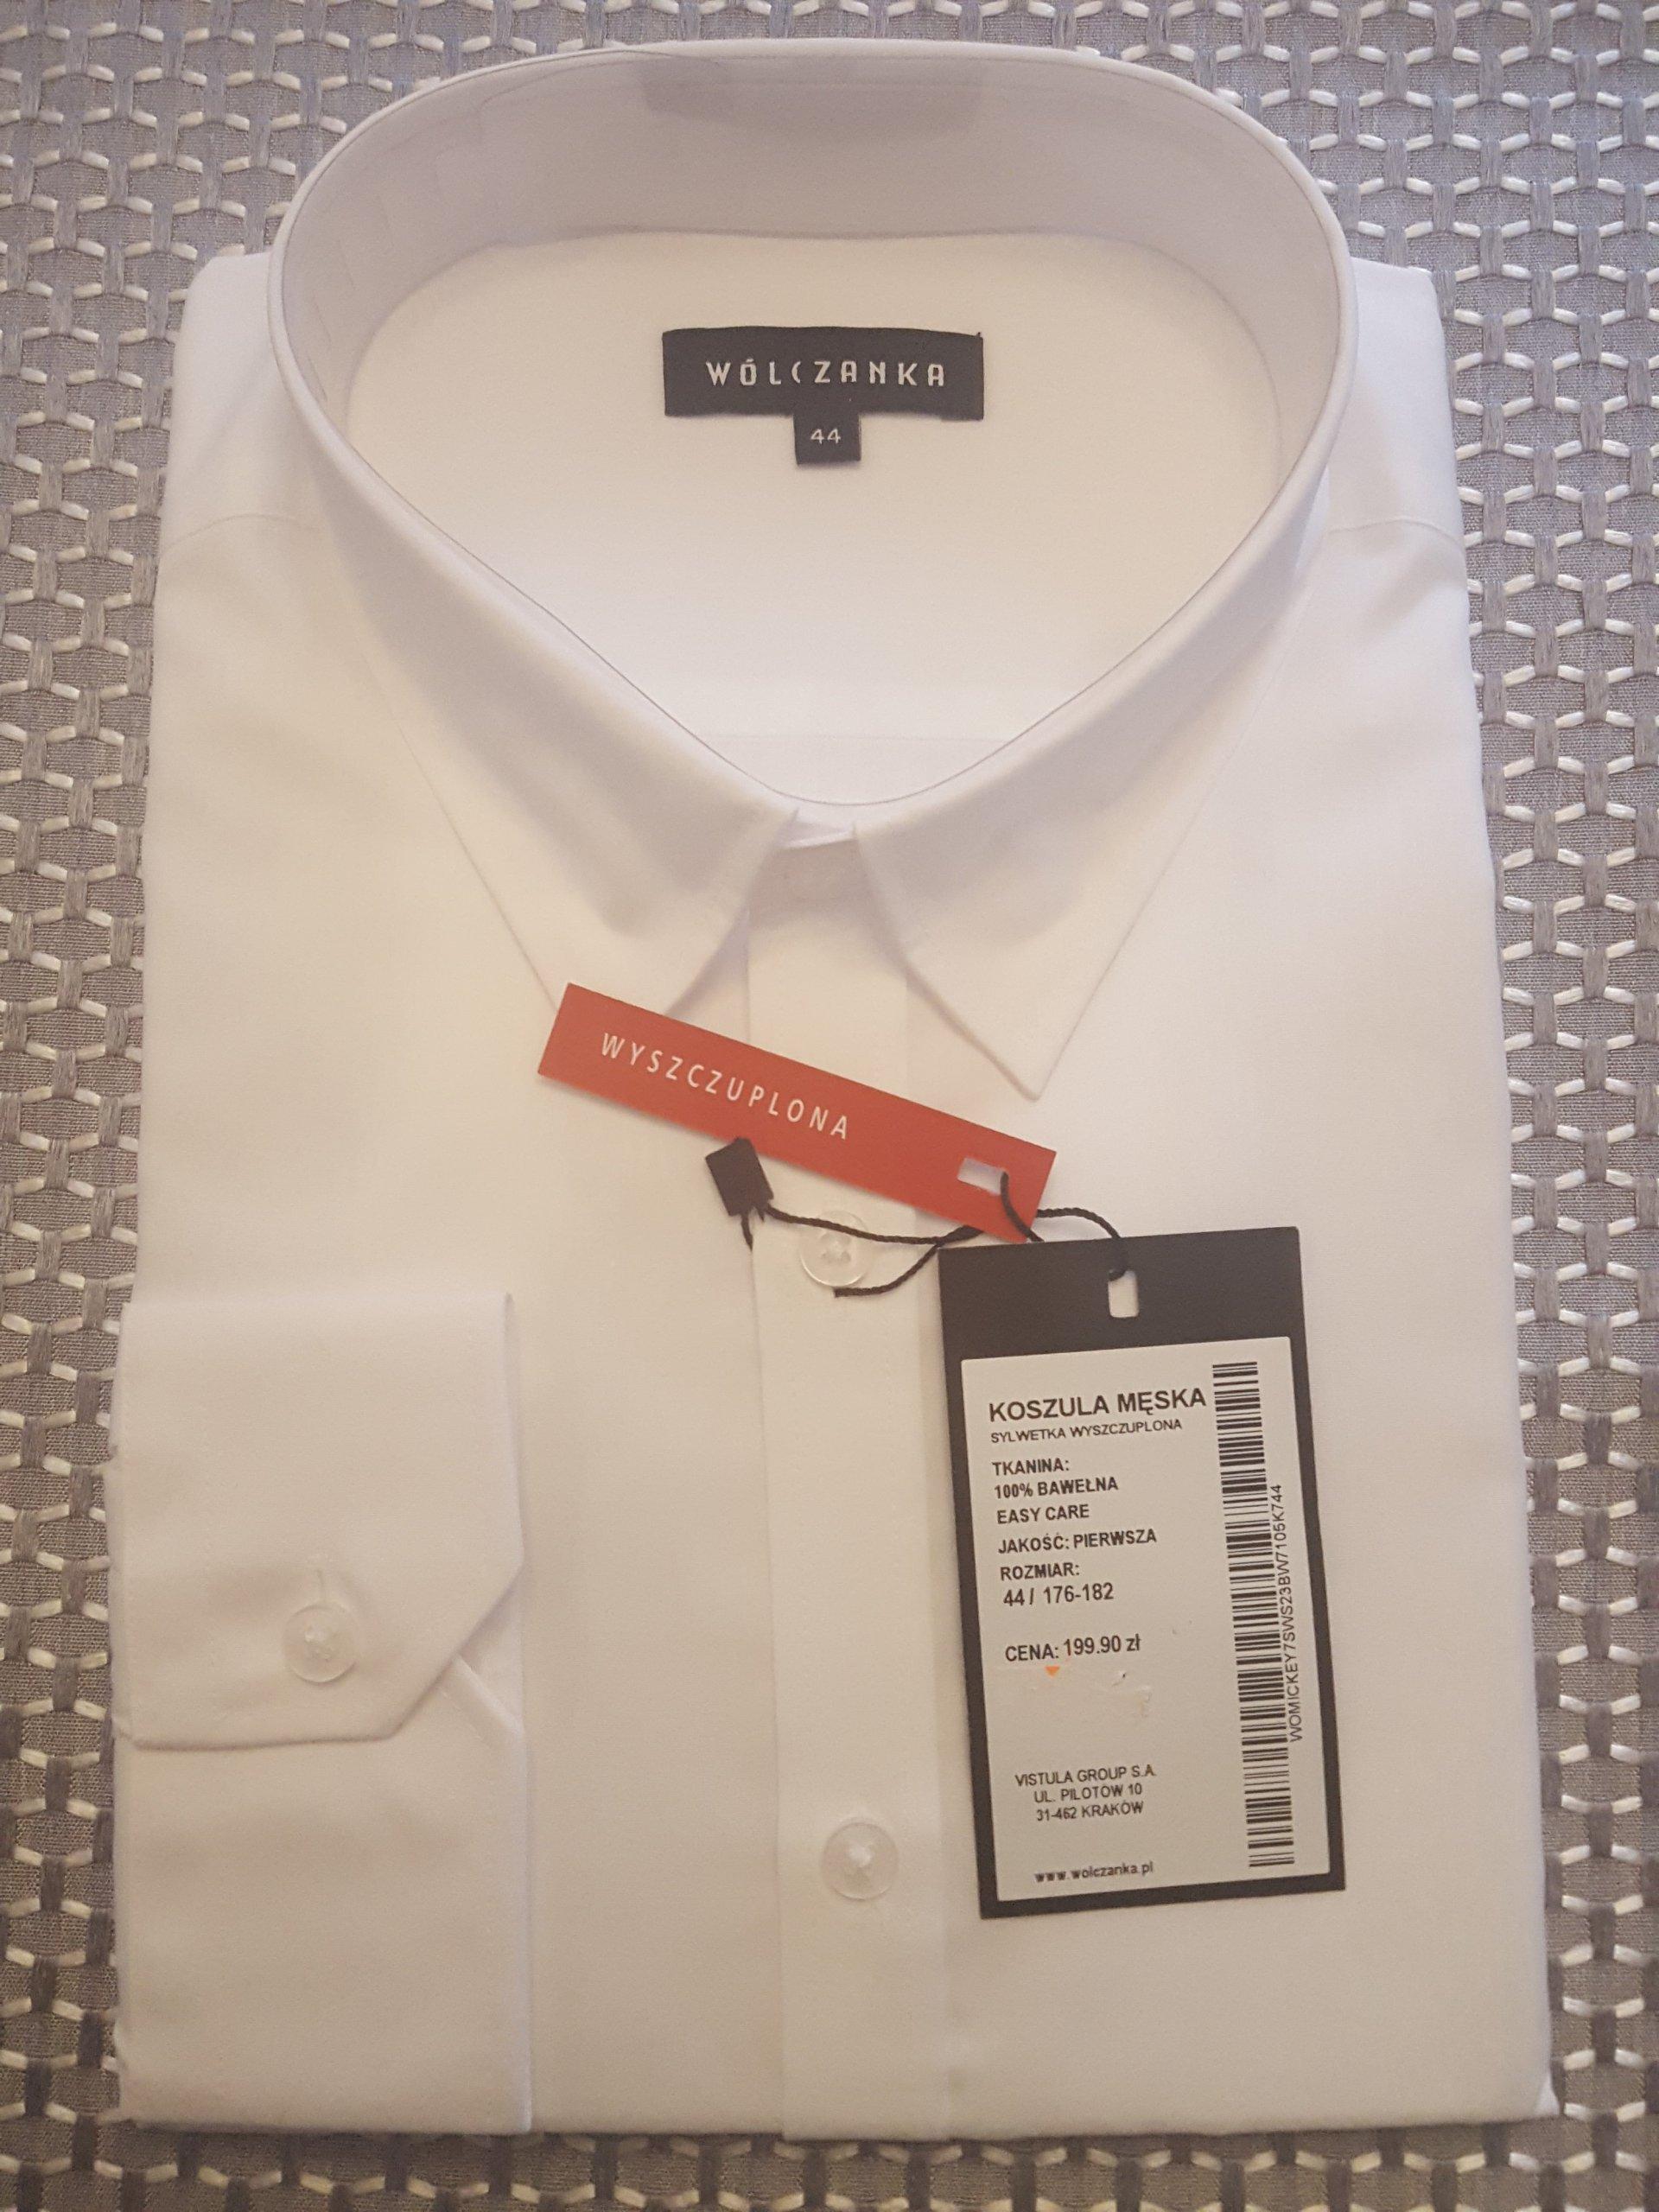 d3a116c04 Koszula męska biała Wólczanka 44 / 176 - 182 - 7324625045 ...